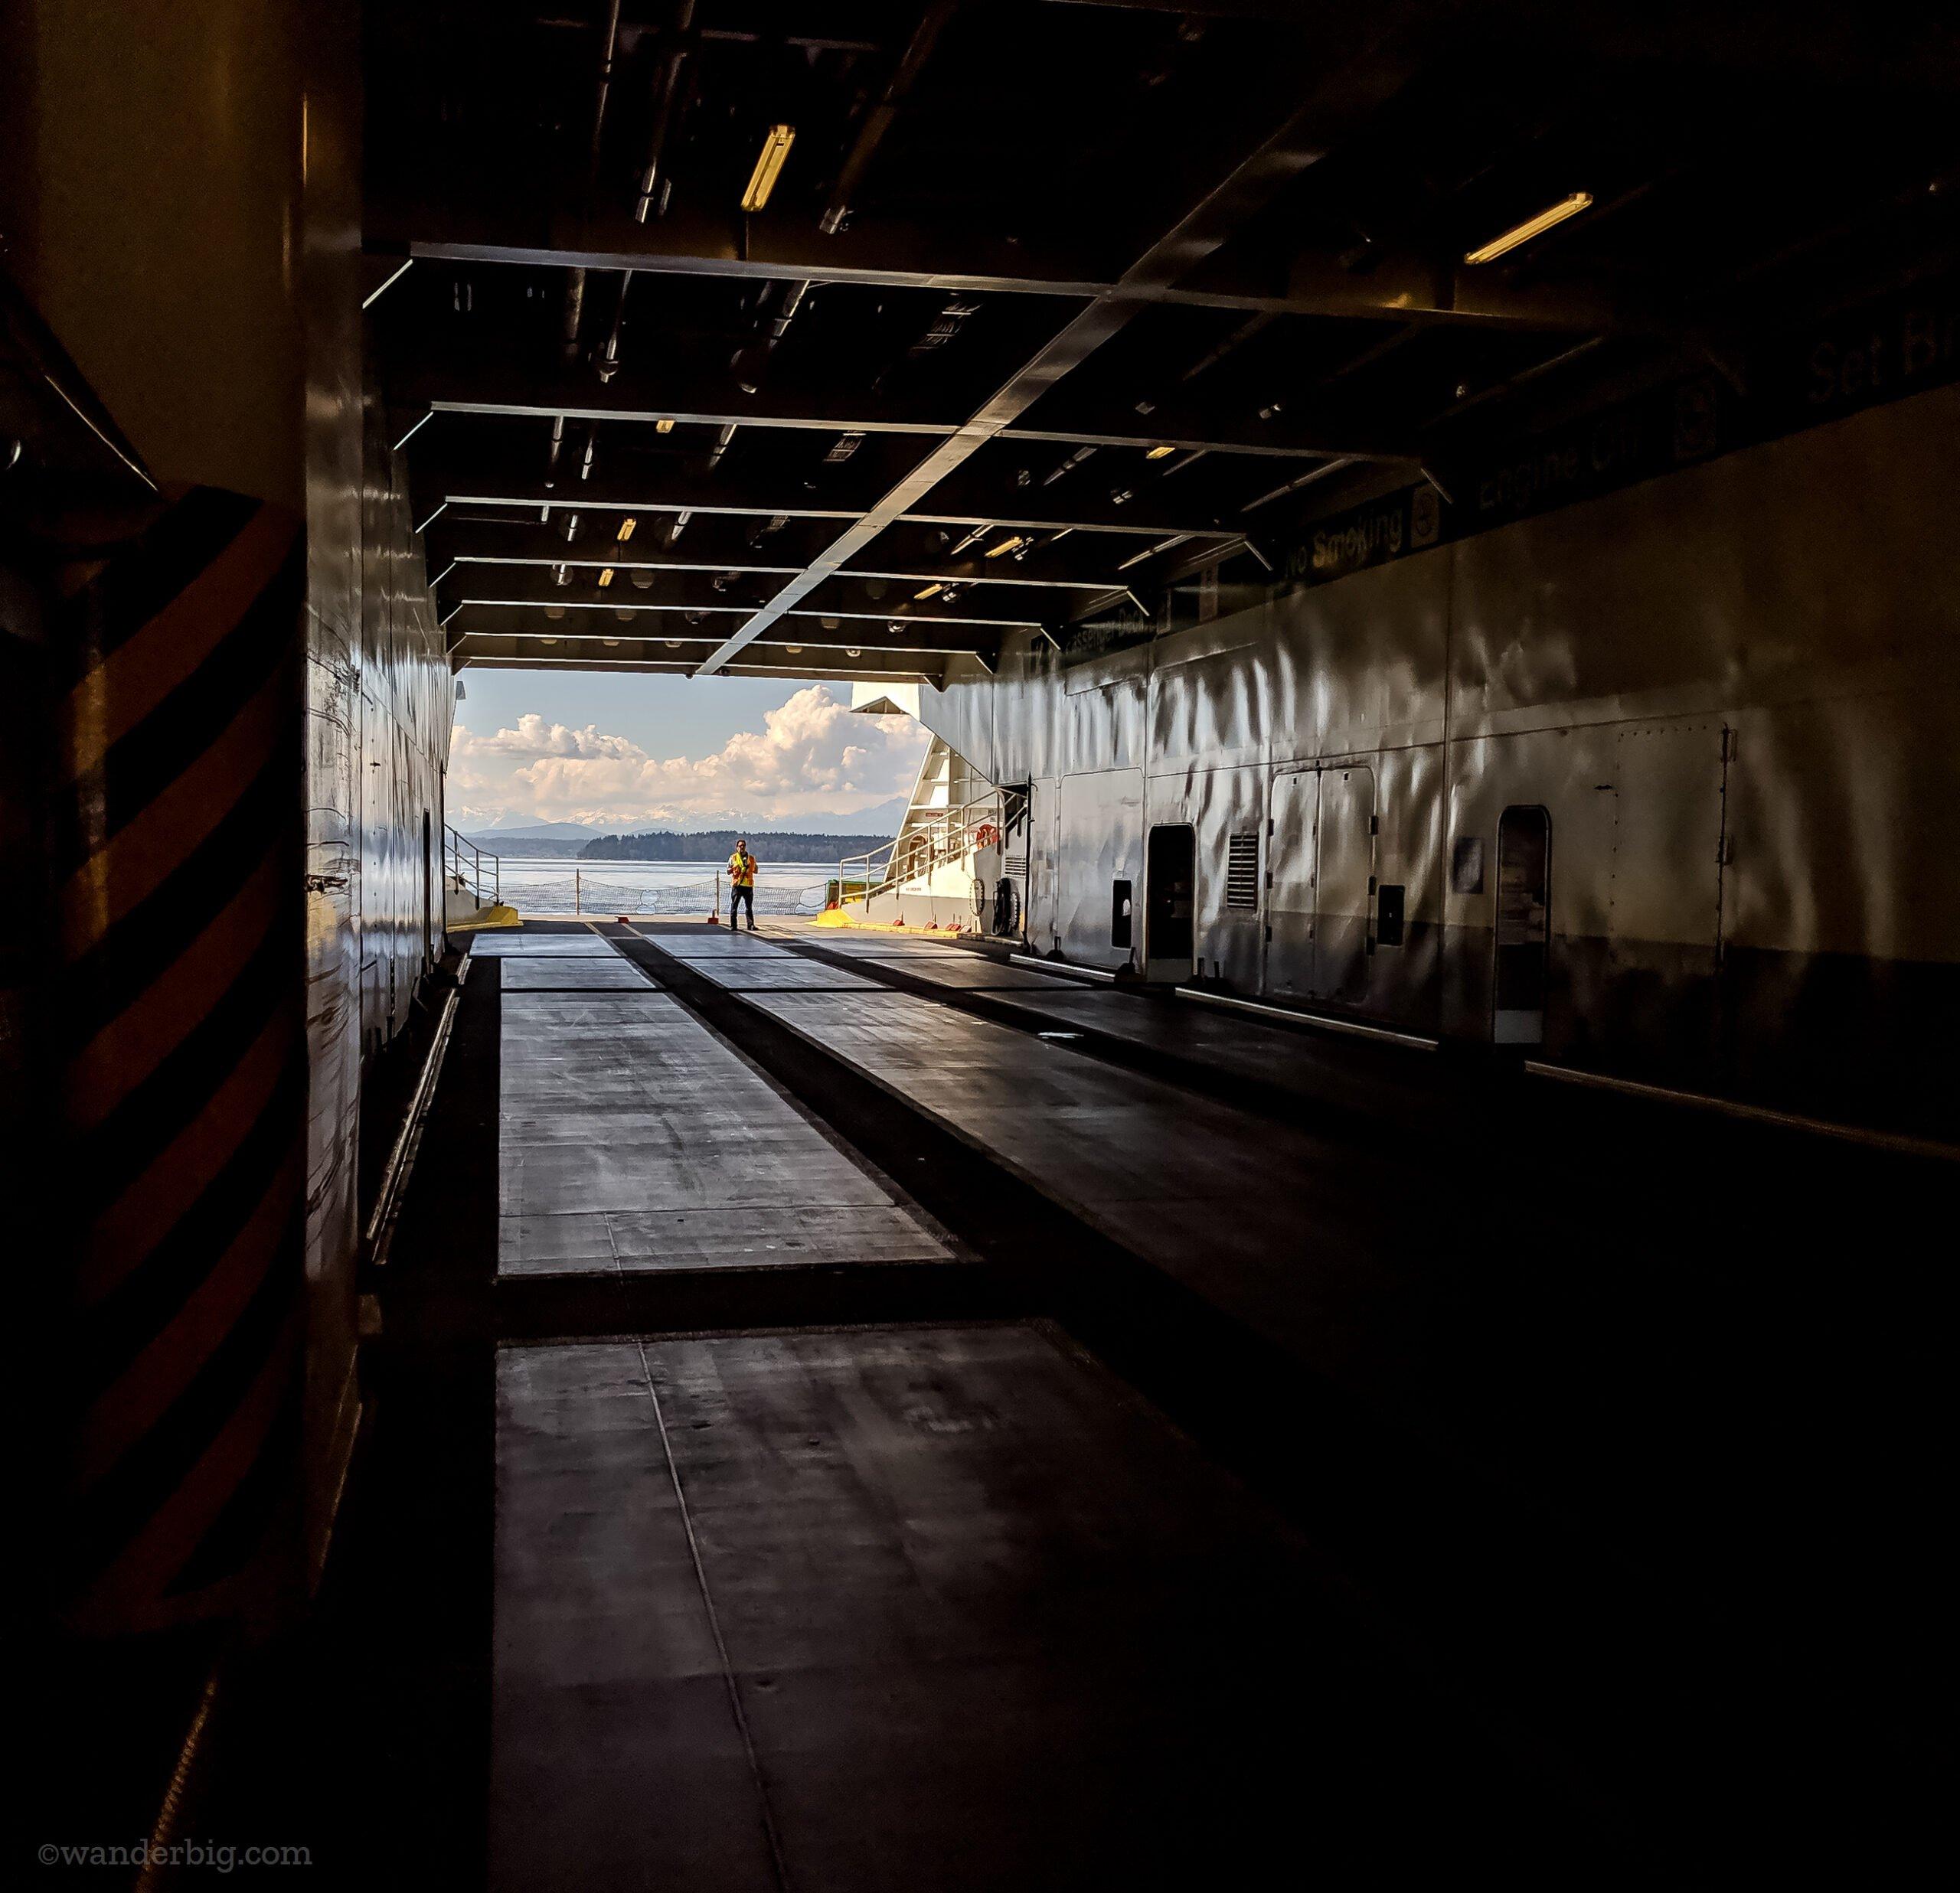 An empty car deck on a washington state ferry